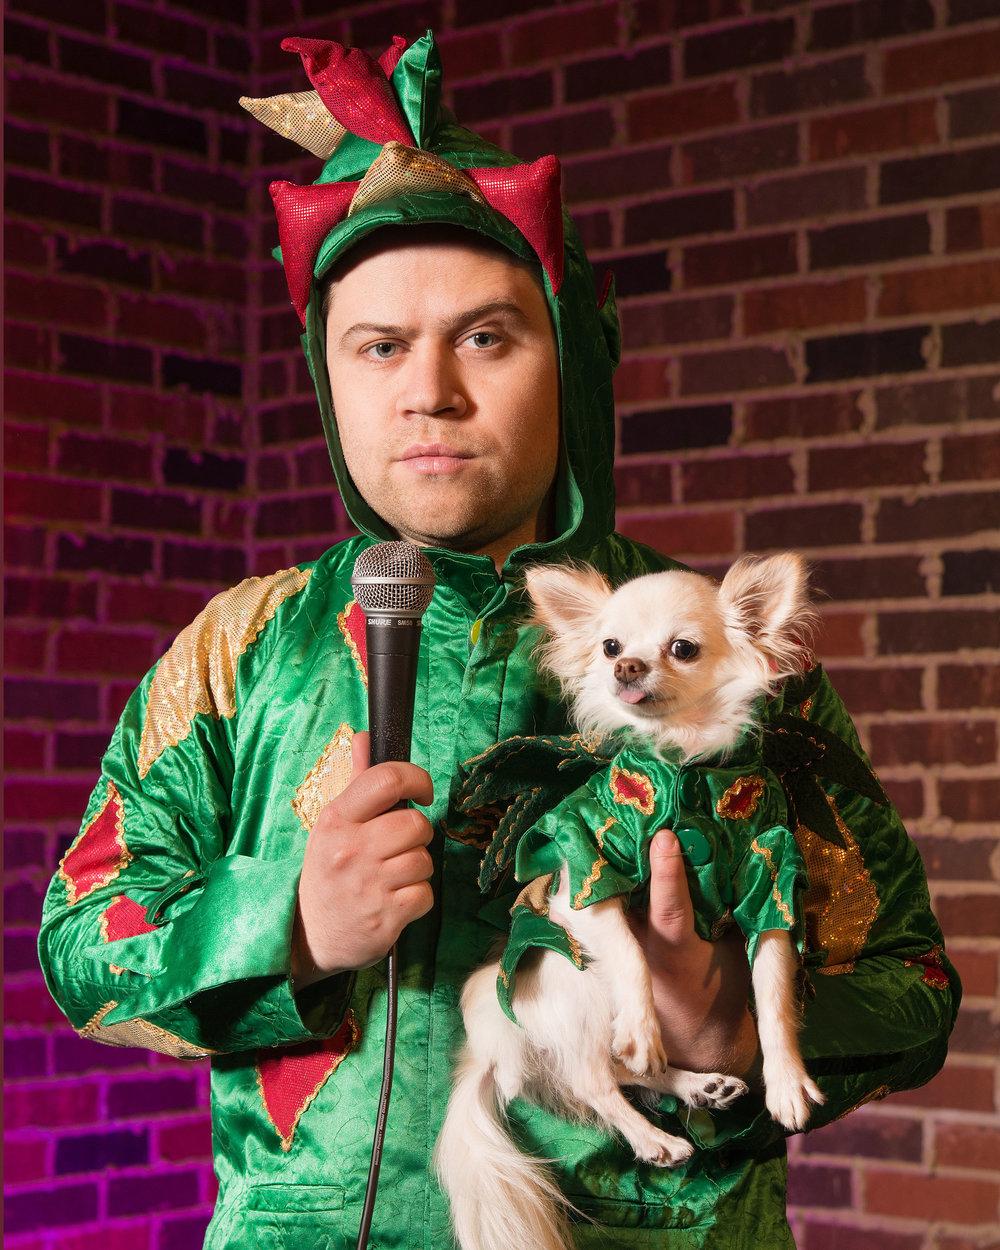 Piff The Magic Dragon - America's Got Talent